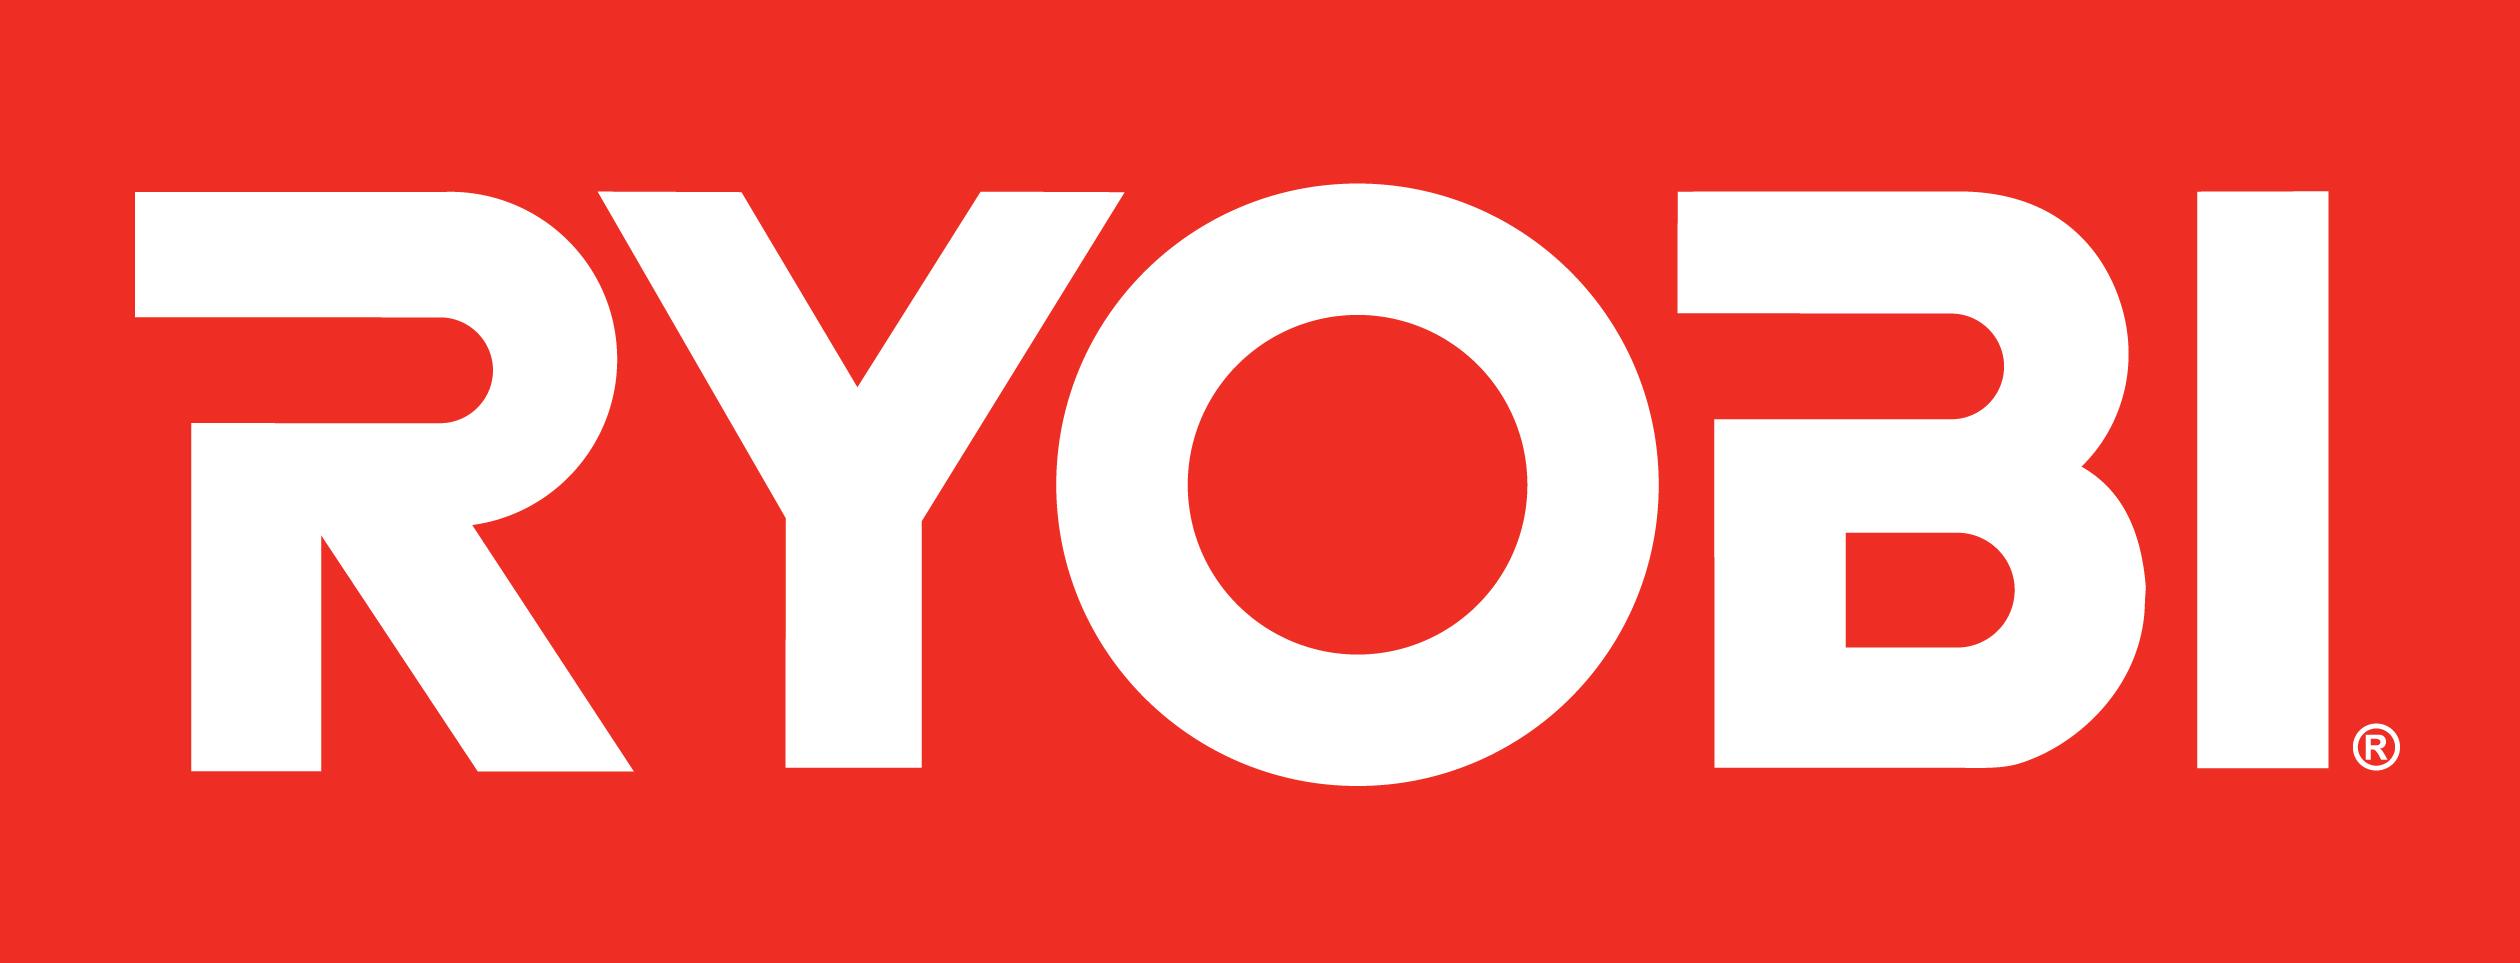 Woodworking ryobi woodworking tools PDF Free Download